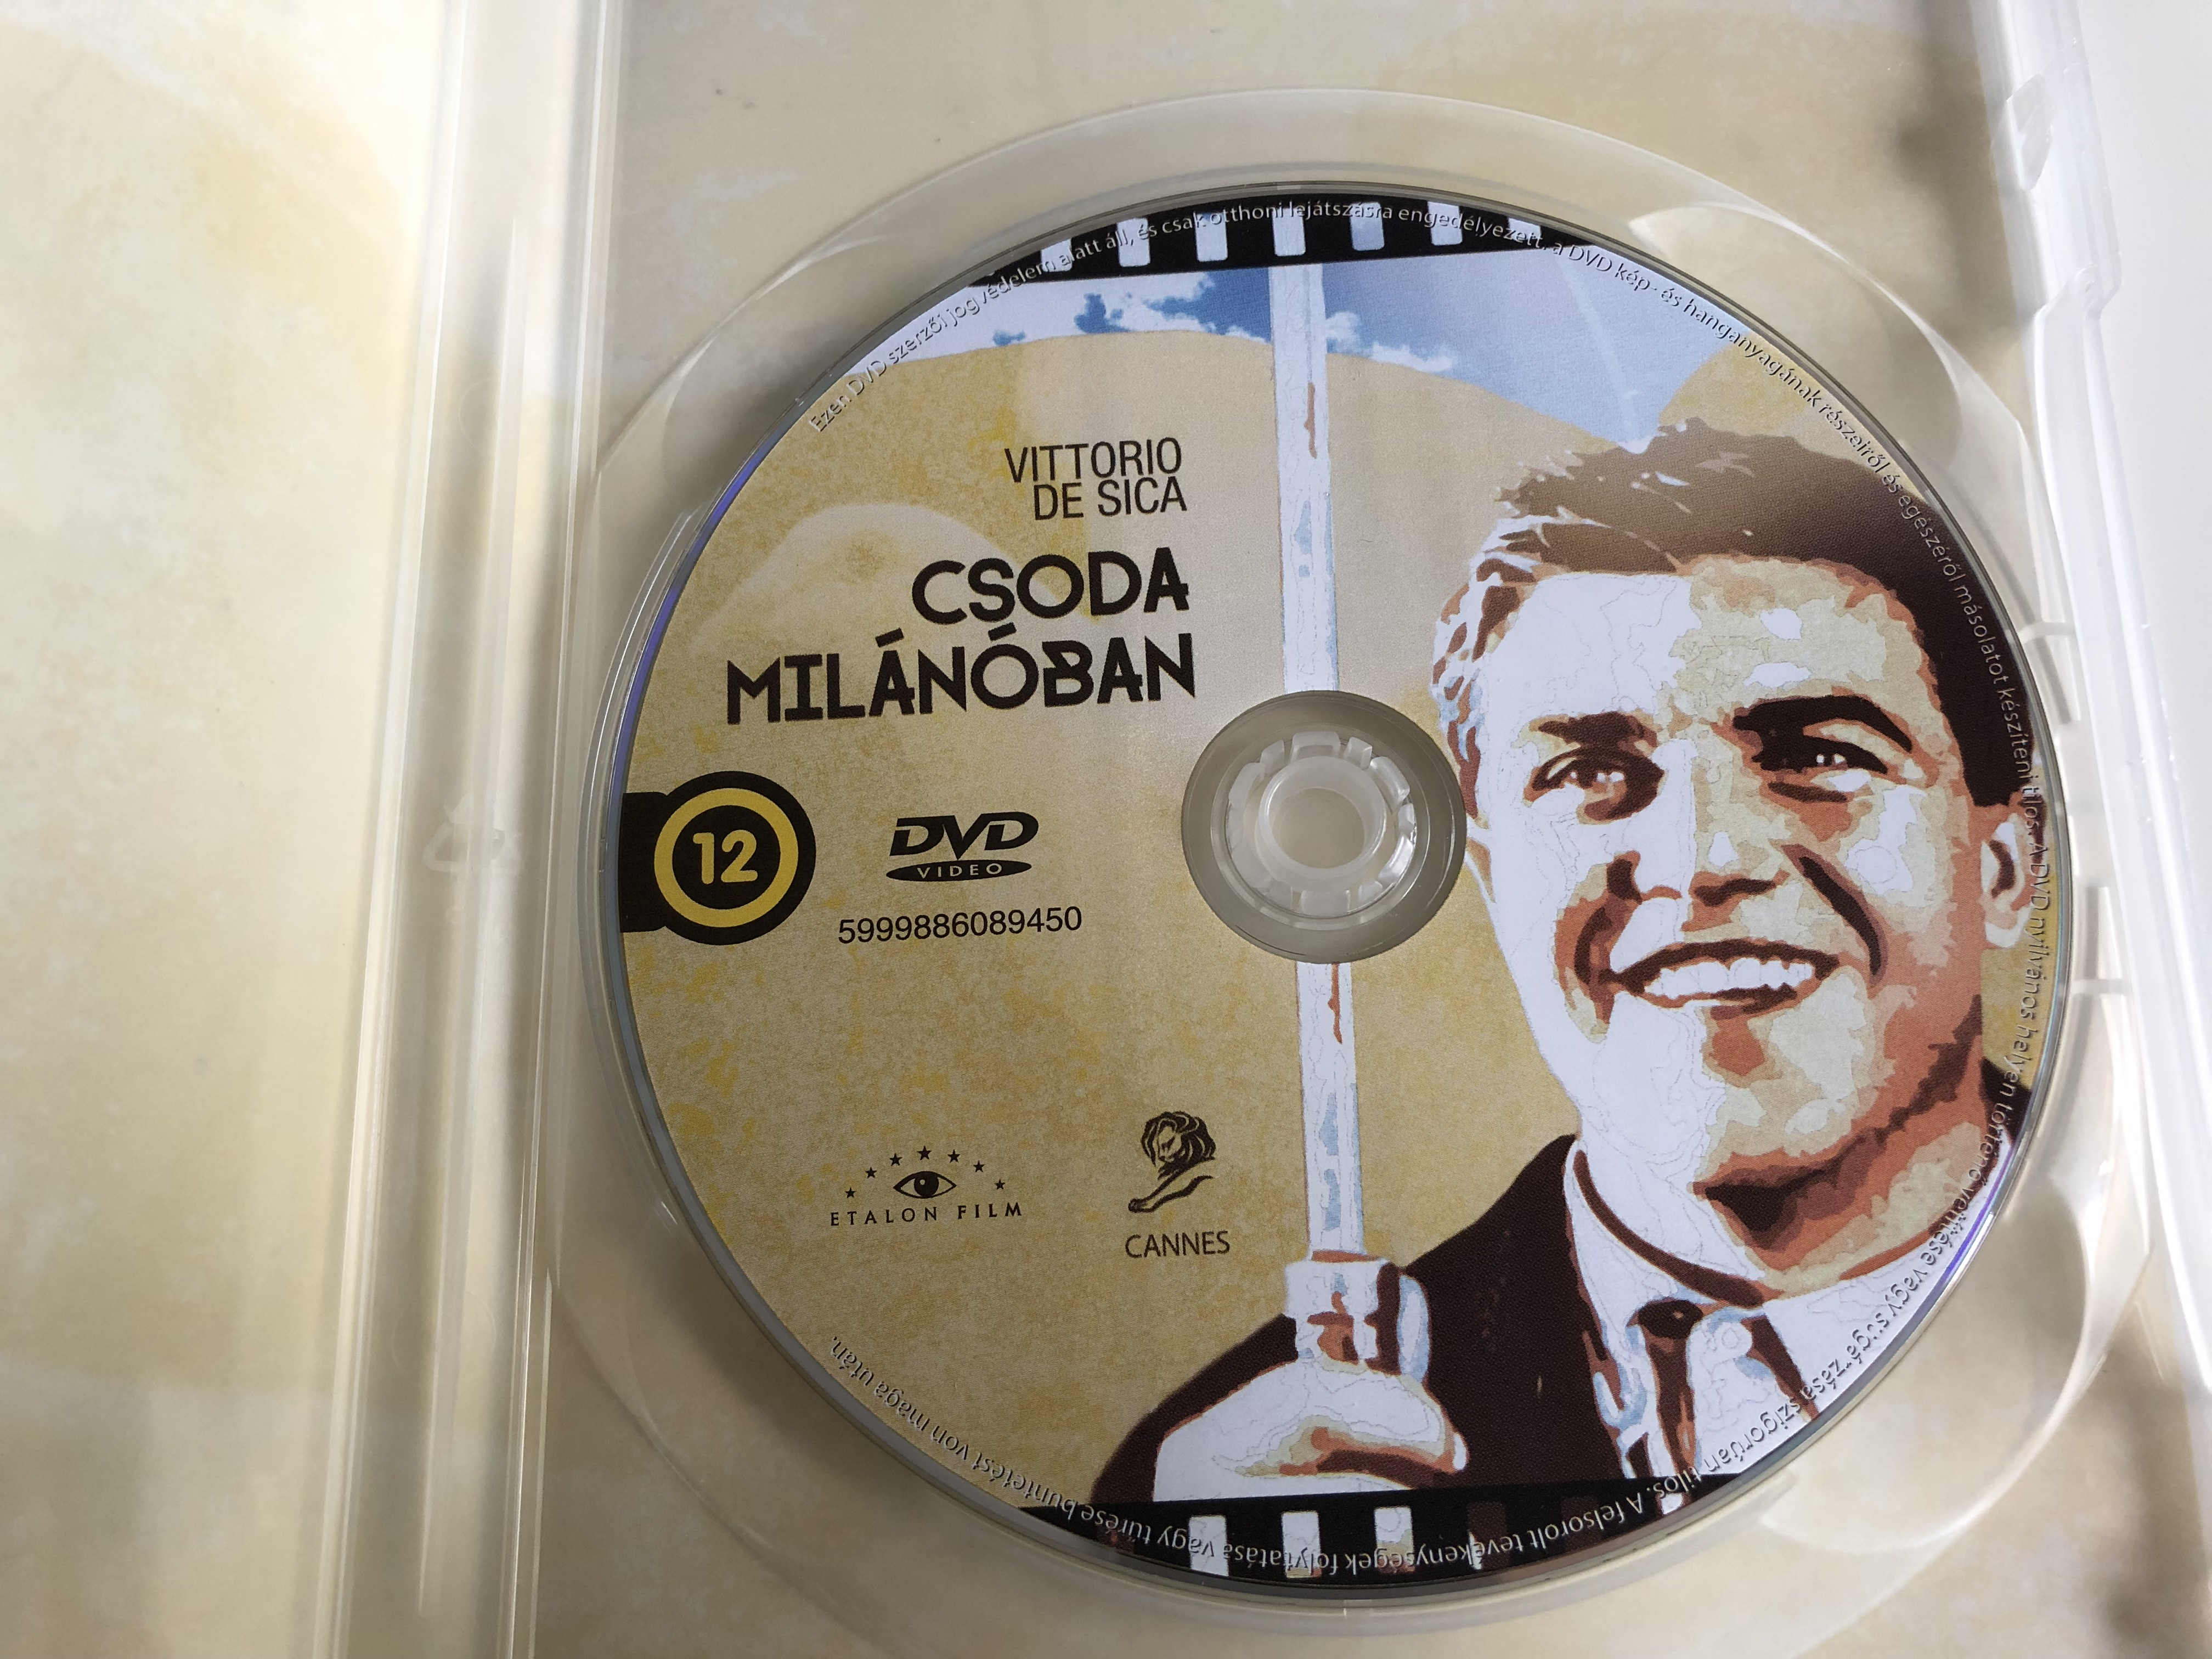 miracolo-a-milano-dvd-1951-csoda-mil-n-ban-miracle-in-milan-directed-by-vittorio-de-sica-starring-emma-gramatica-francesco-golisano-2-.jpg